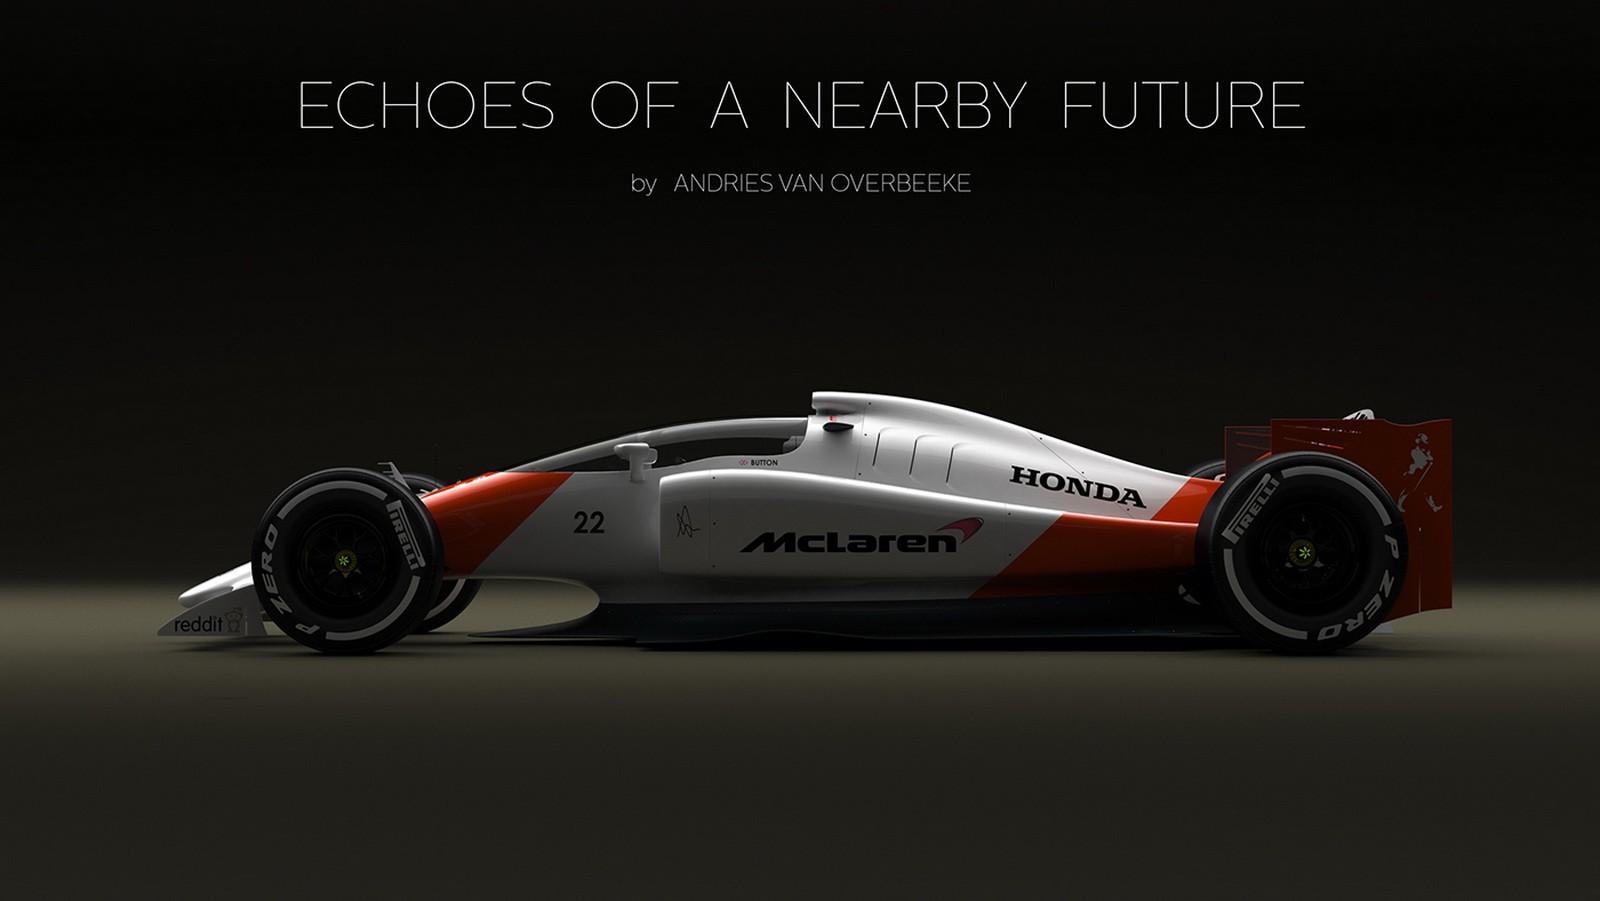 future-formula-1-concept-earns-closed-cockpit-honda-mclaren-livery-photo-gallery_5